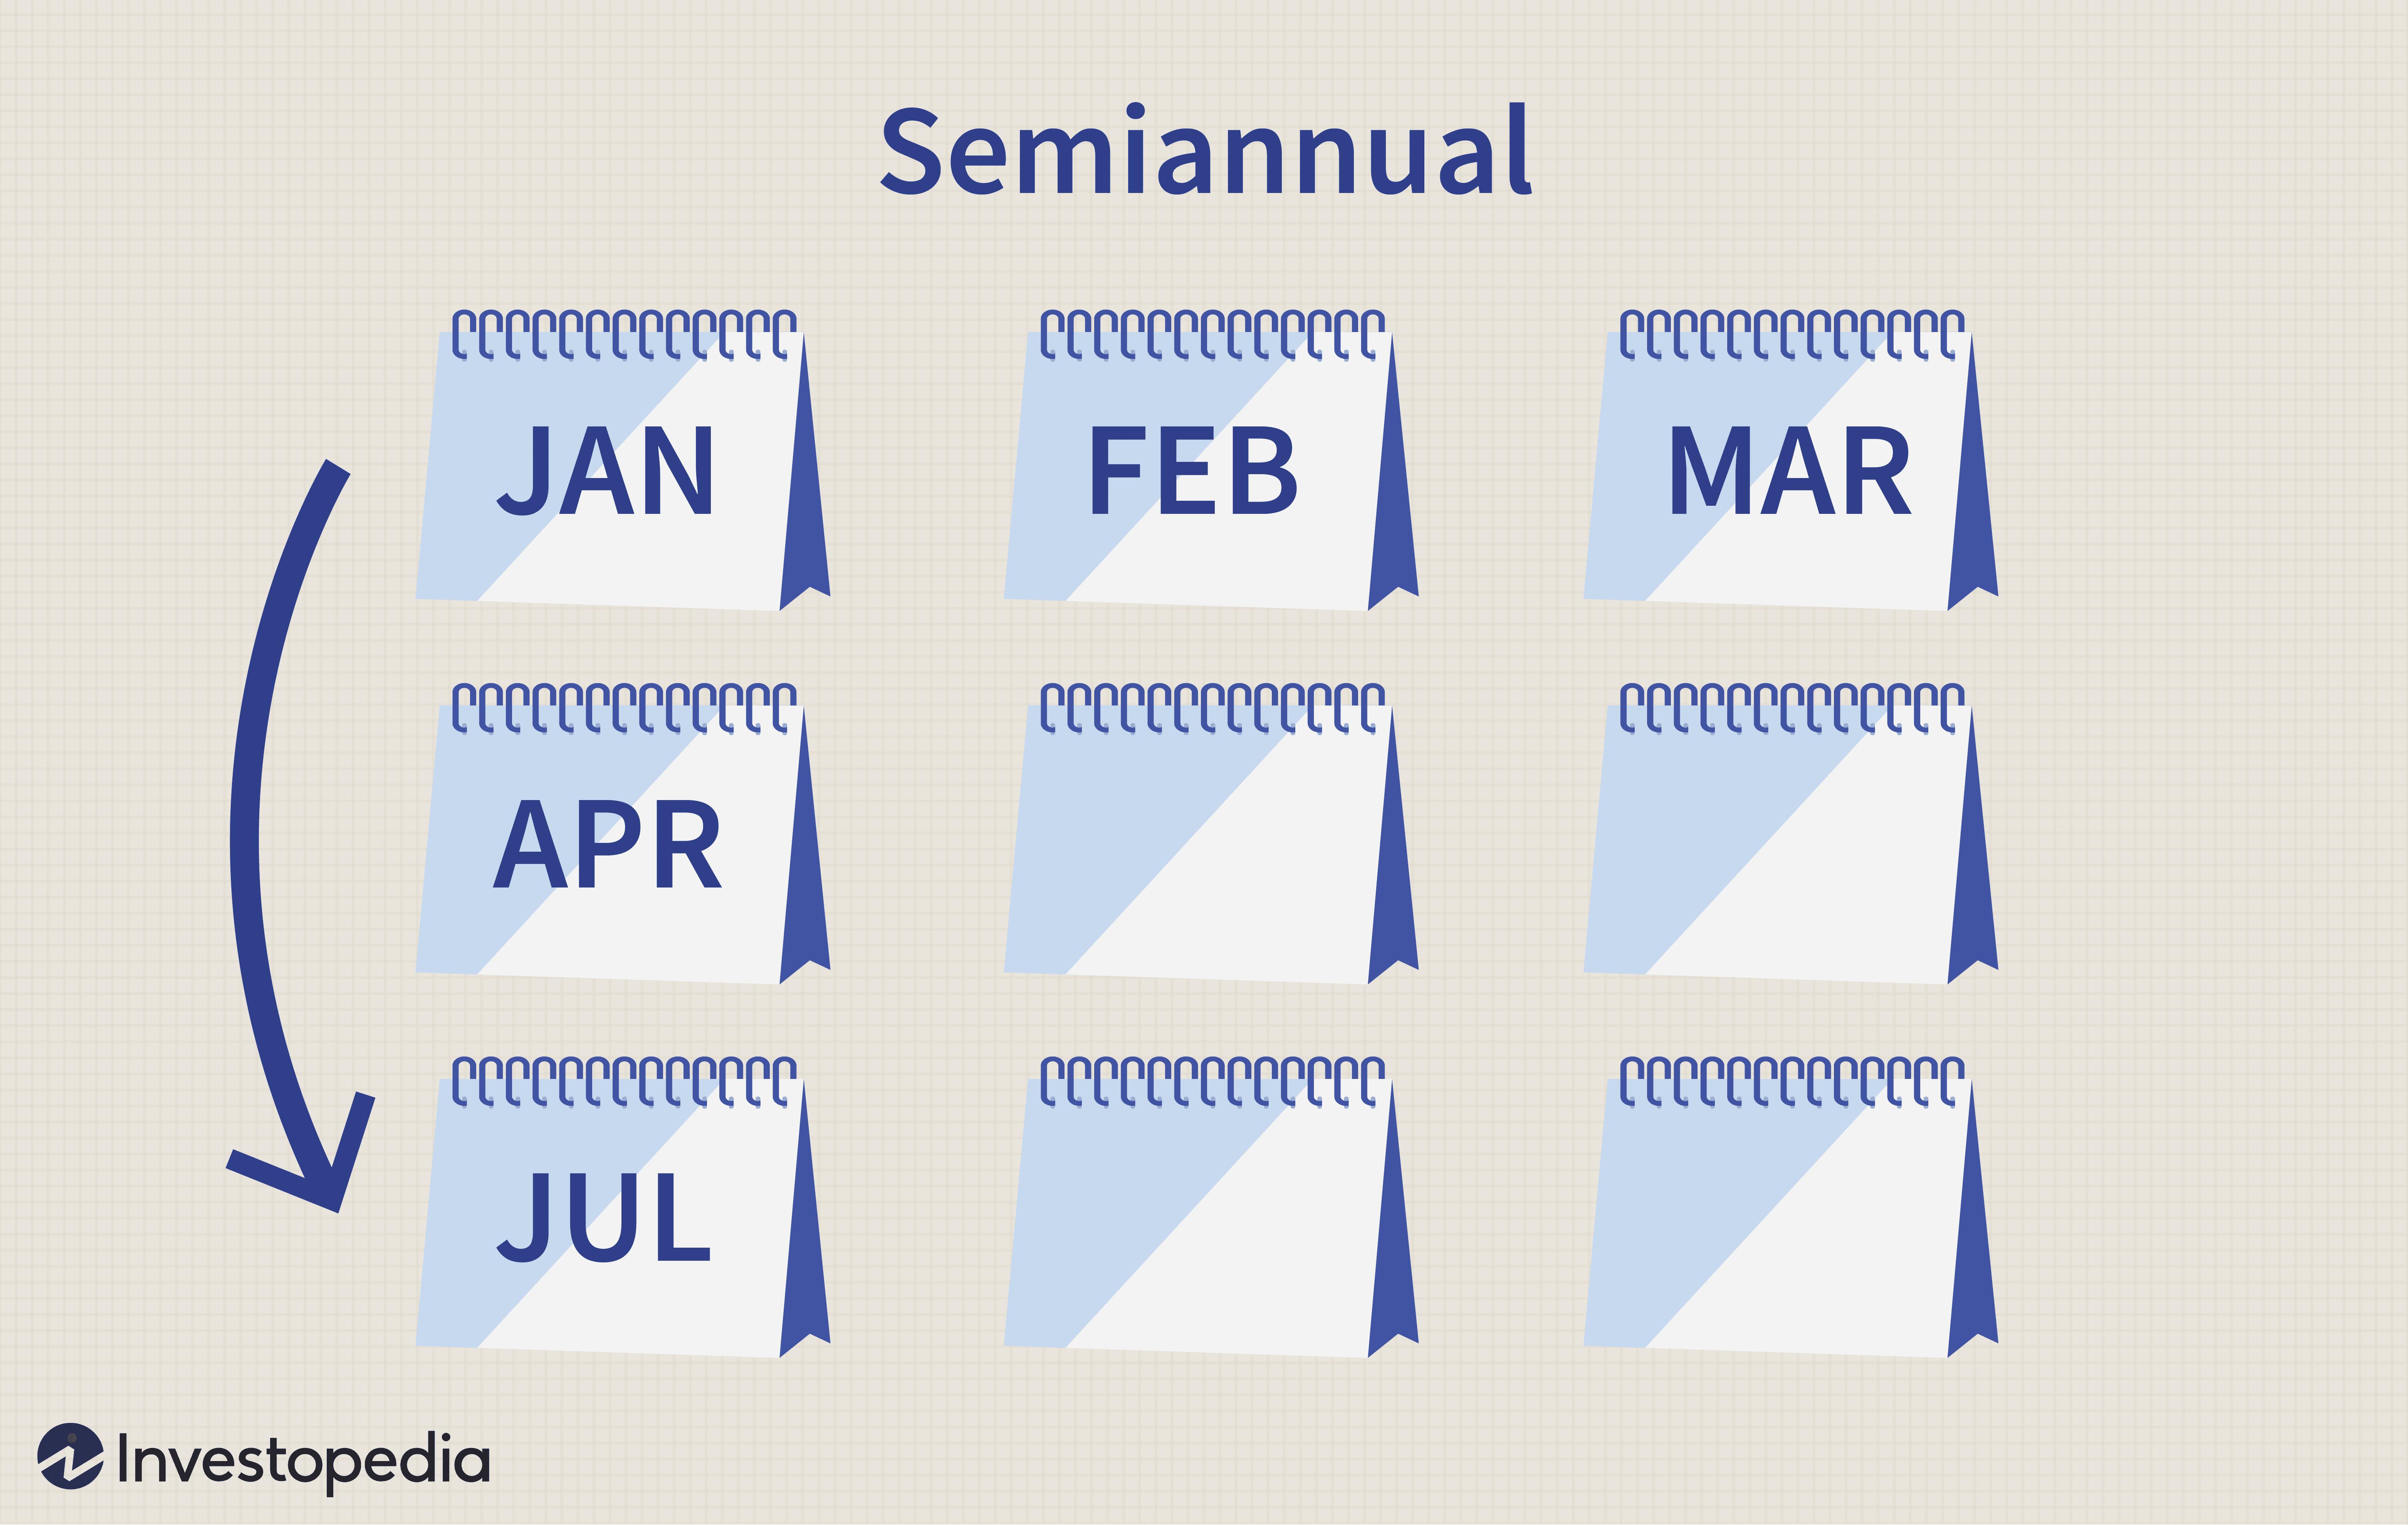 Semiannual